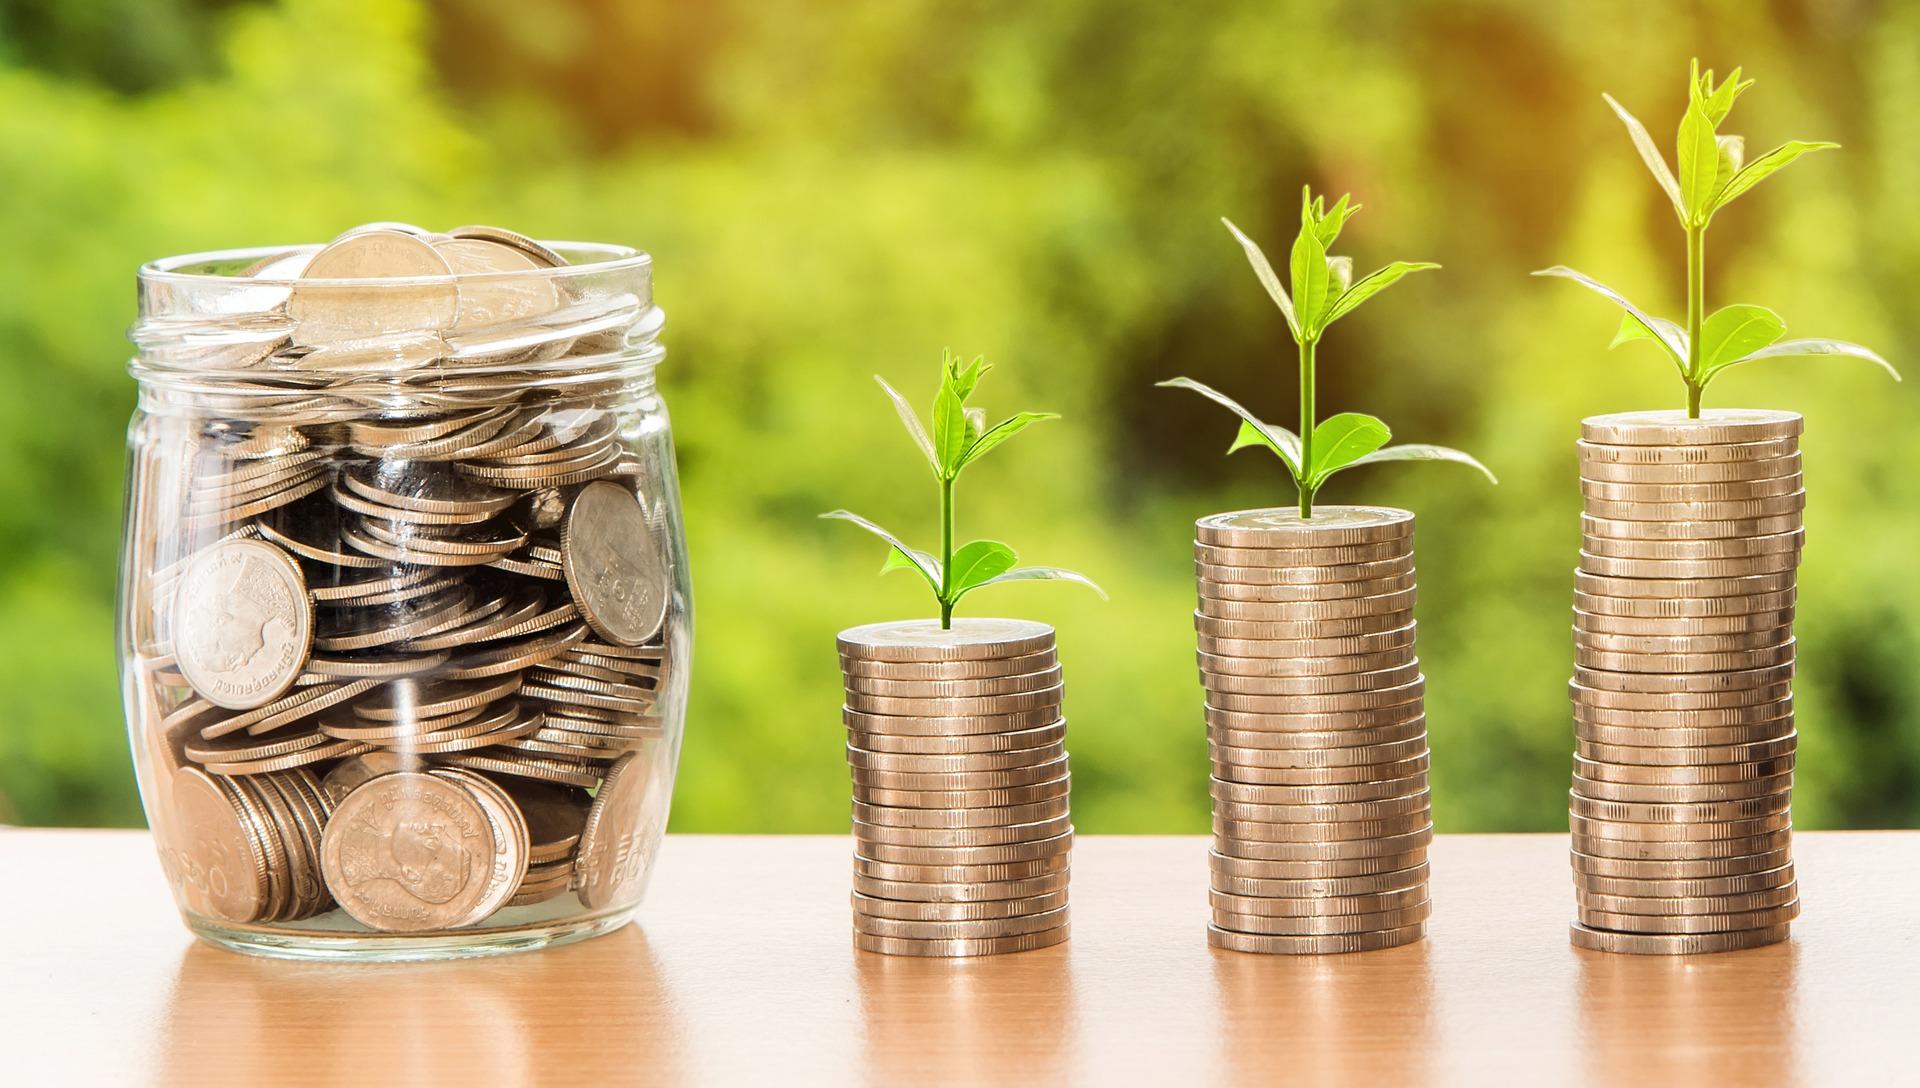 "Money image: Attributed to: Image by <a href=""https://pixabay.com/users/nattanan23-6312362/?utm_source=link-attribution&amp;utm_medium=referral&amp;utm_campaign=image&amp;utm_content=2696228"">Nattanan Kanchanaprat</a> from <a href=""https://pixabay.com/?utm_source=link-attribution&amp;utm_medium=referral&amp;utm_campaign=image&amp;utm_content=2696228"">Pixabay</a>"